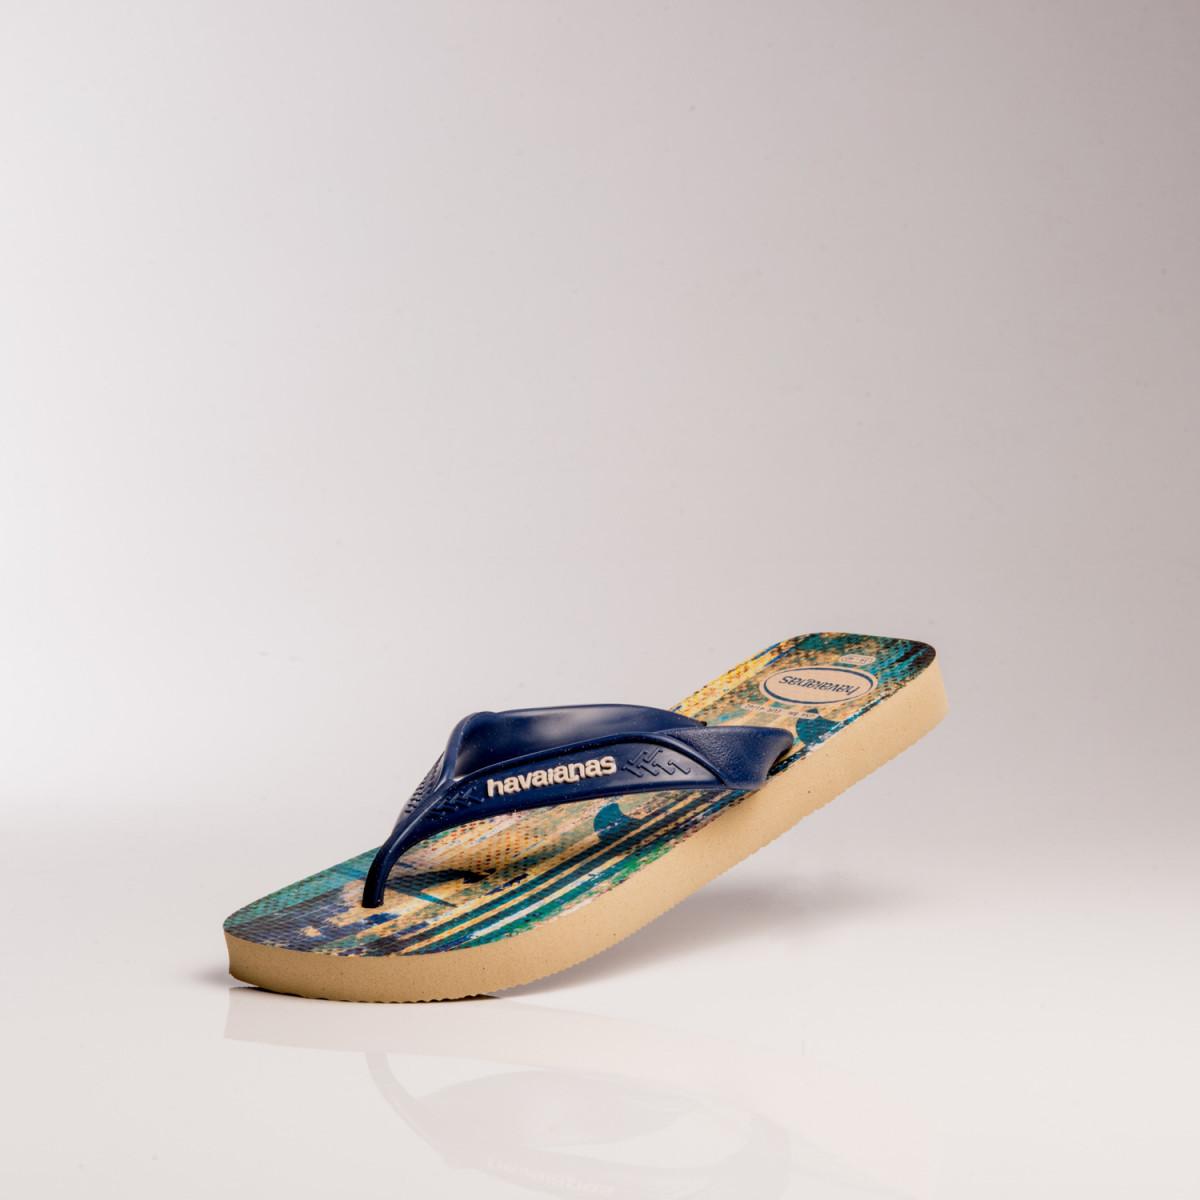 OJOTAS HAVAIANAS SURF